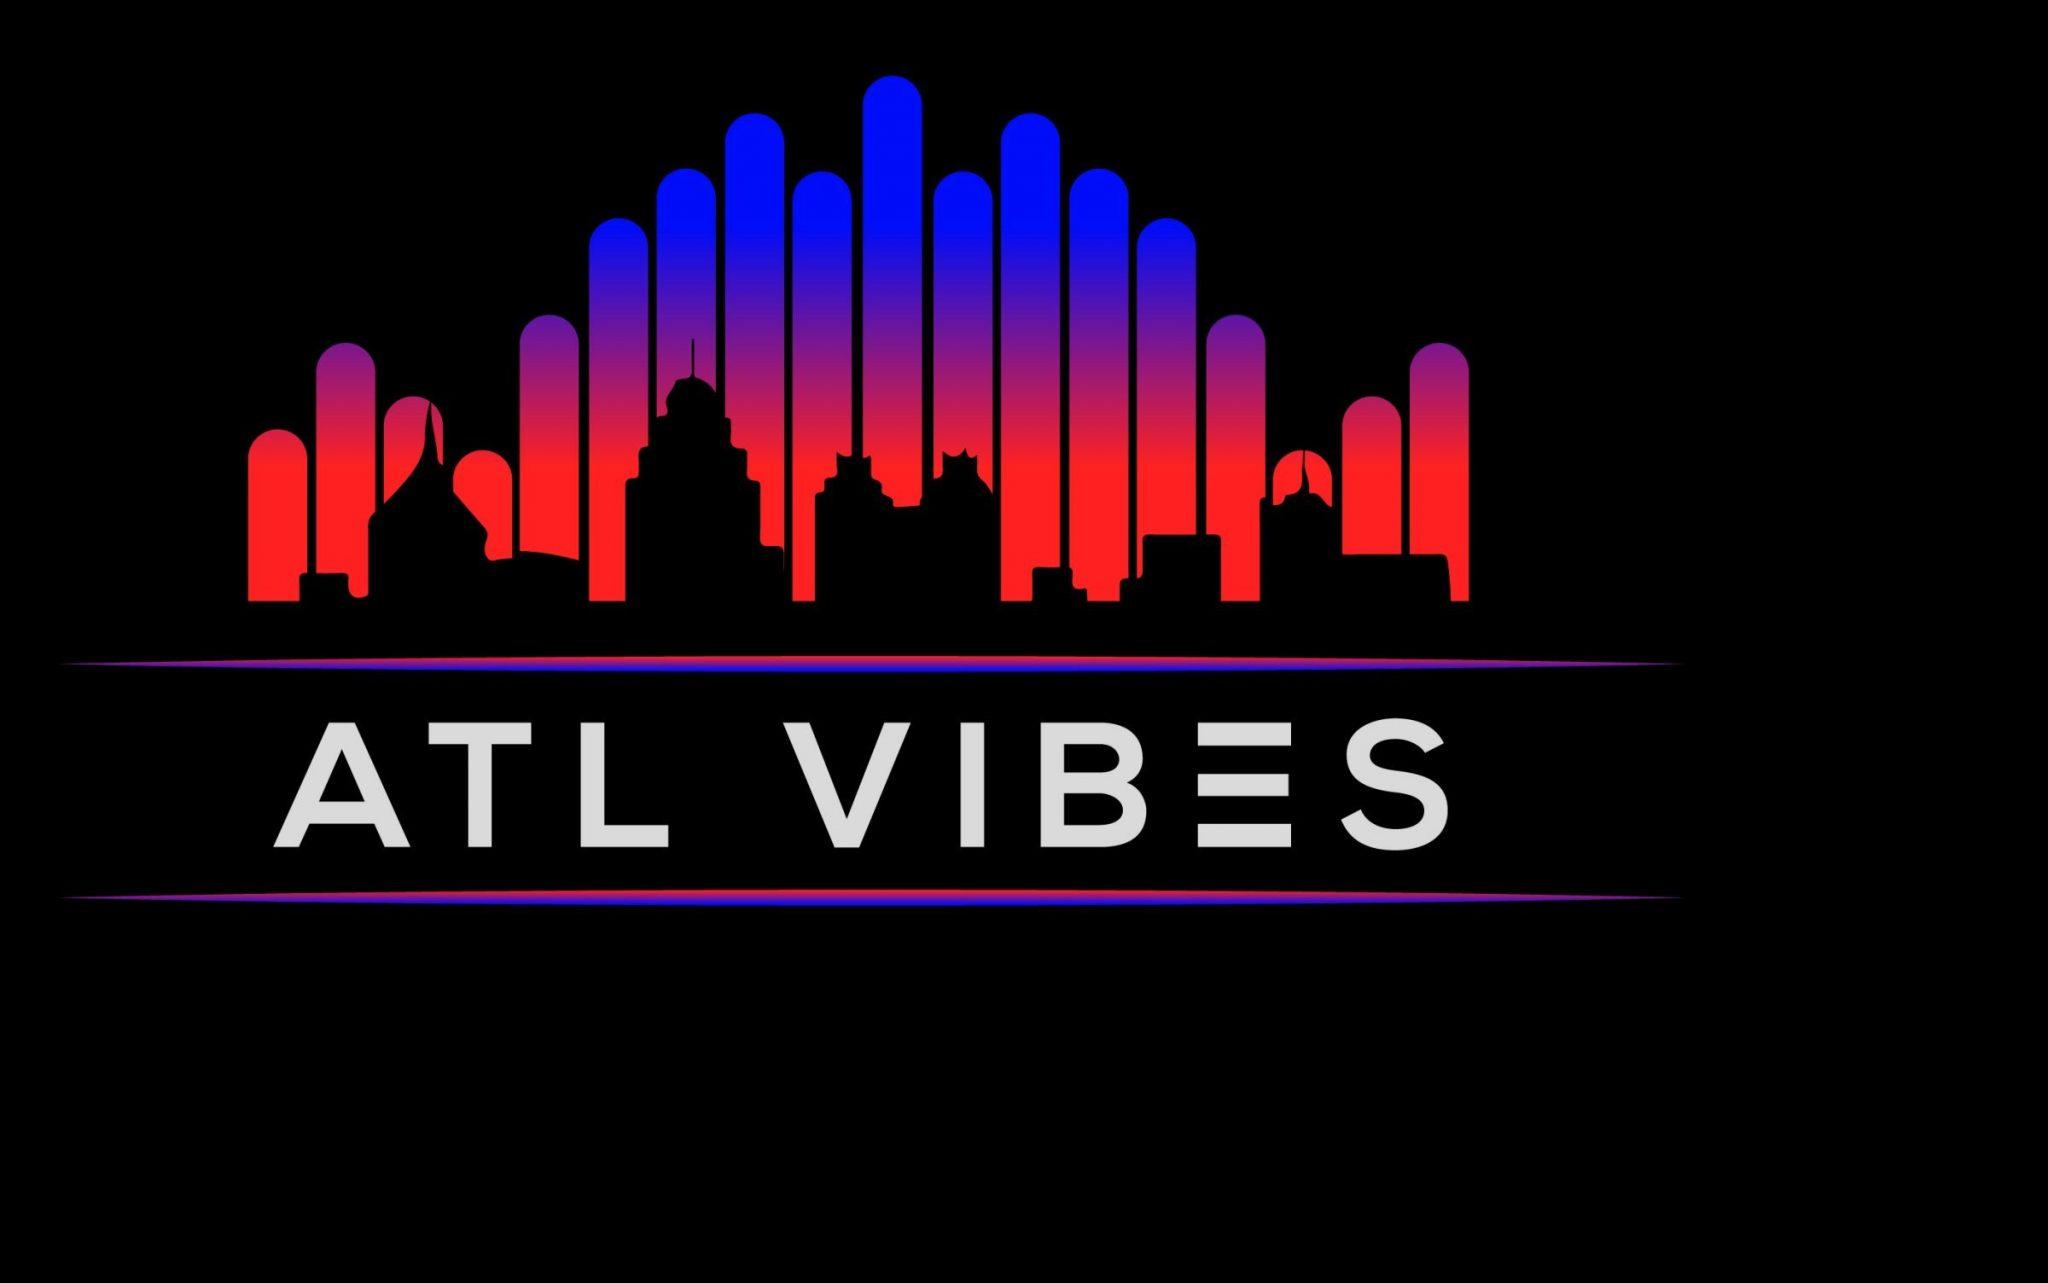 ATL Vibes